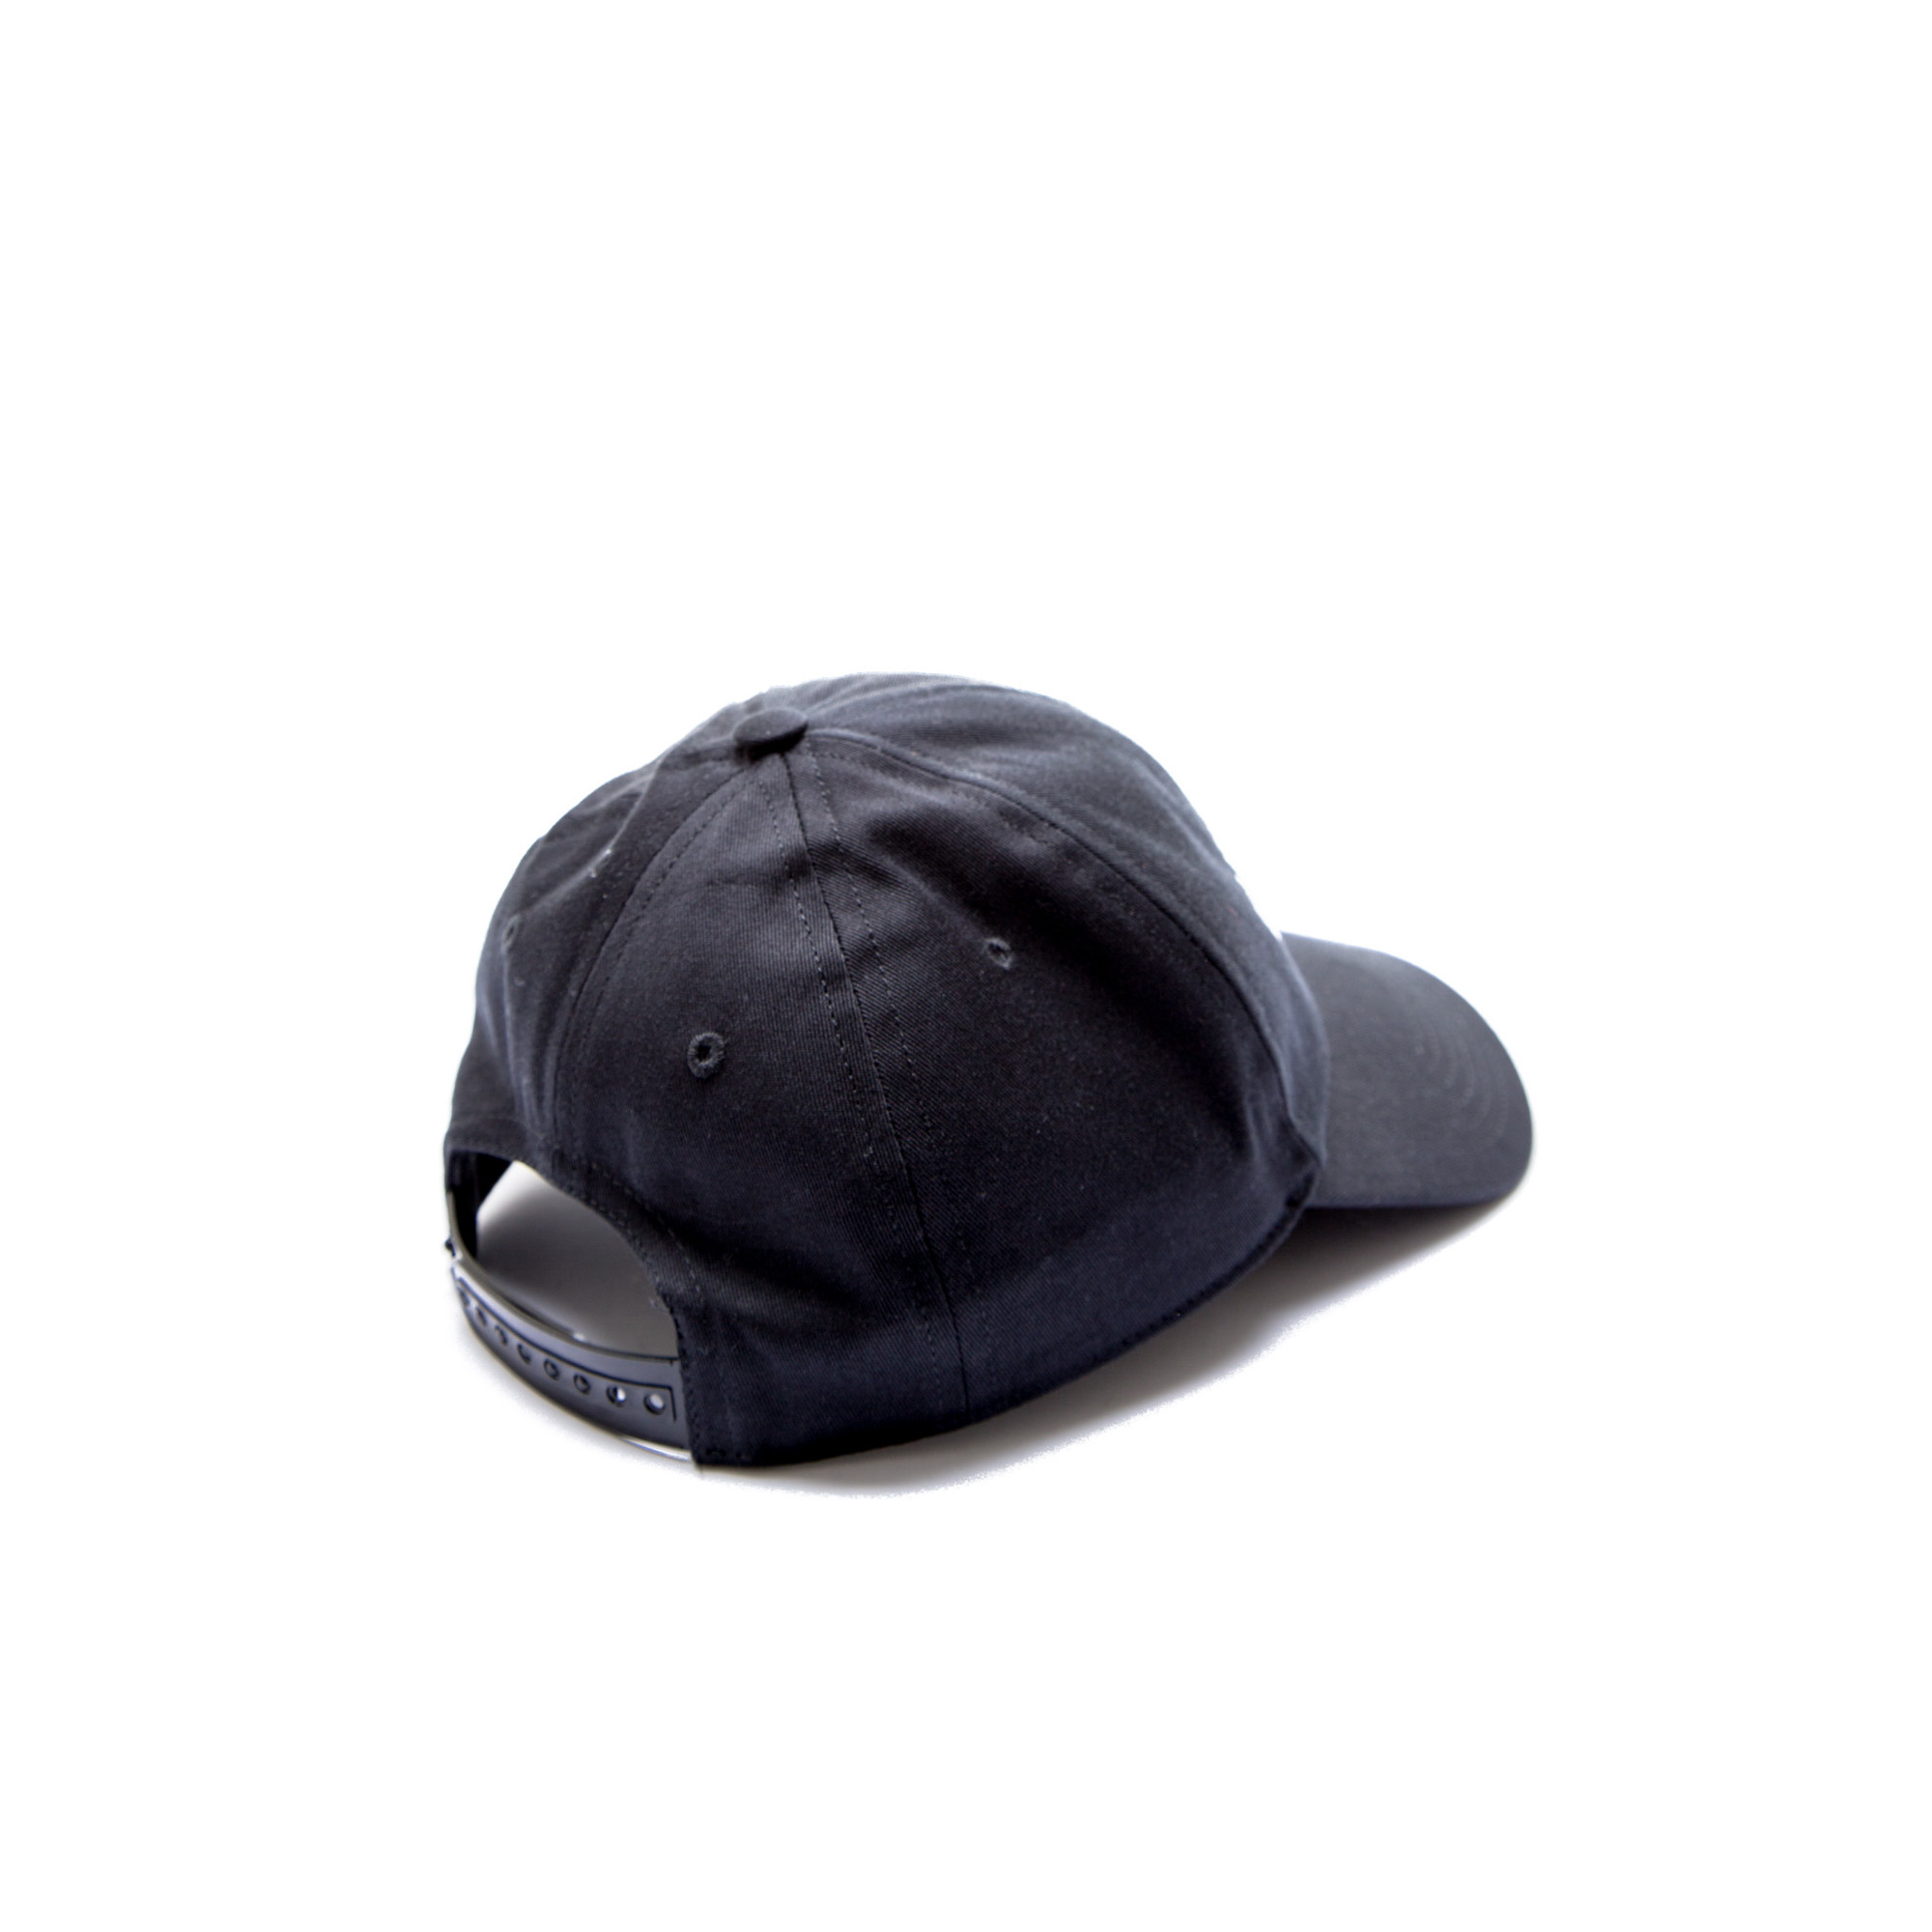 e21faa2b17637 ... Burberry casual baseball cap zwart ...